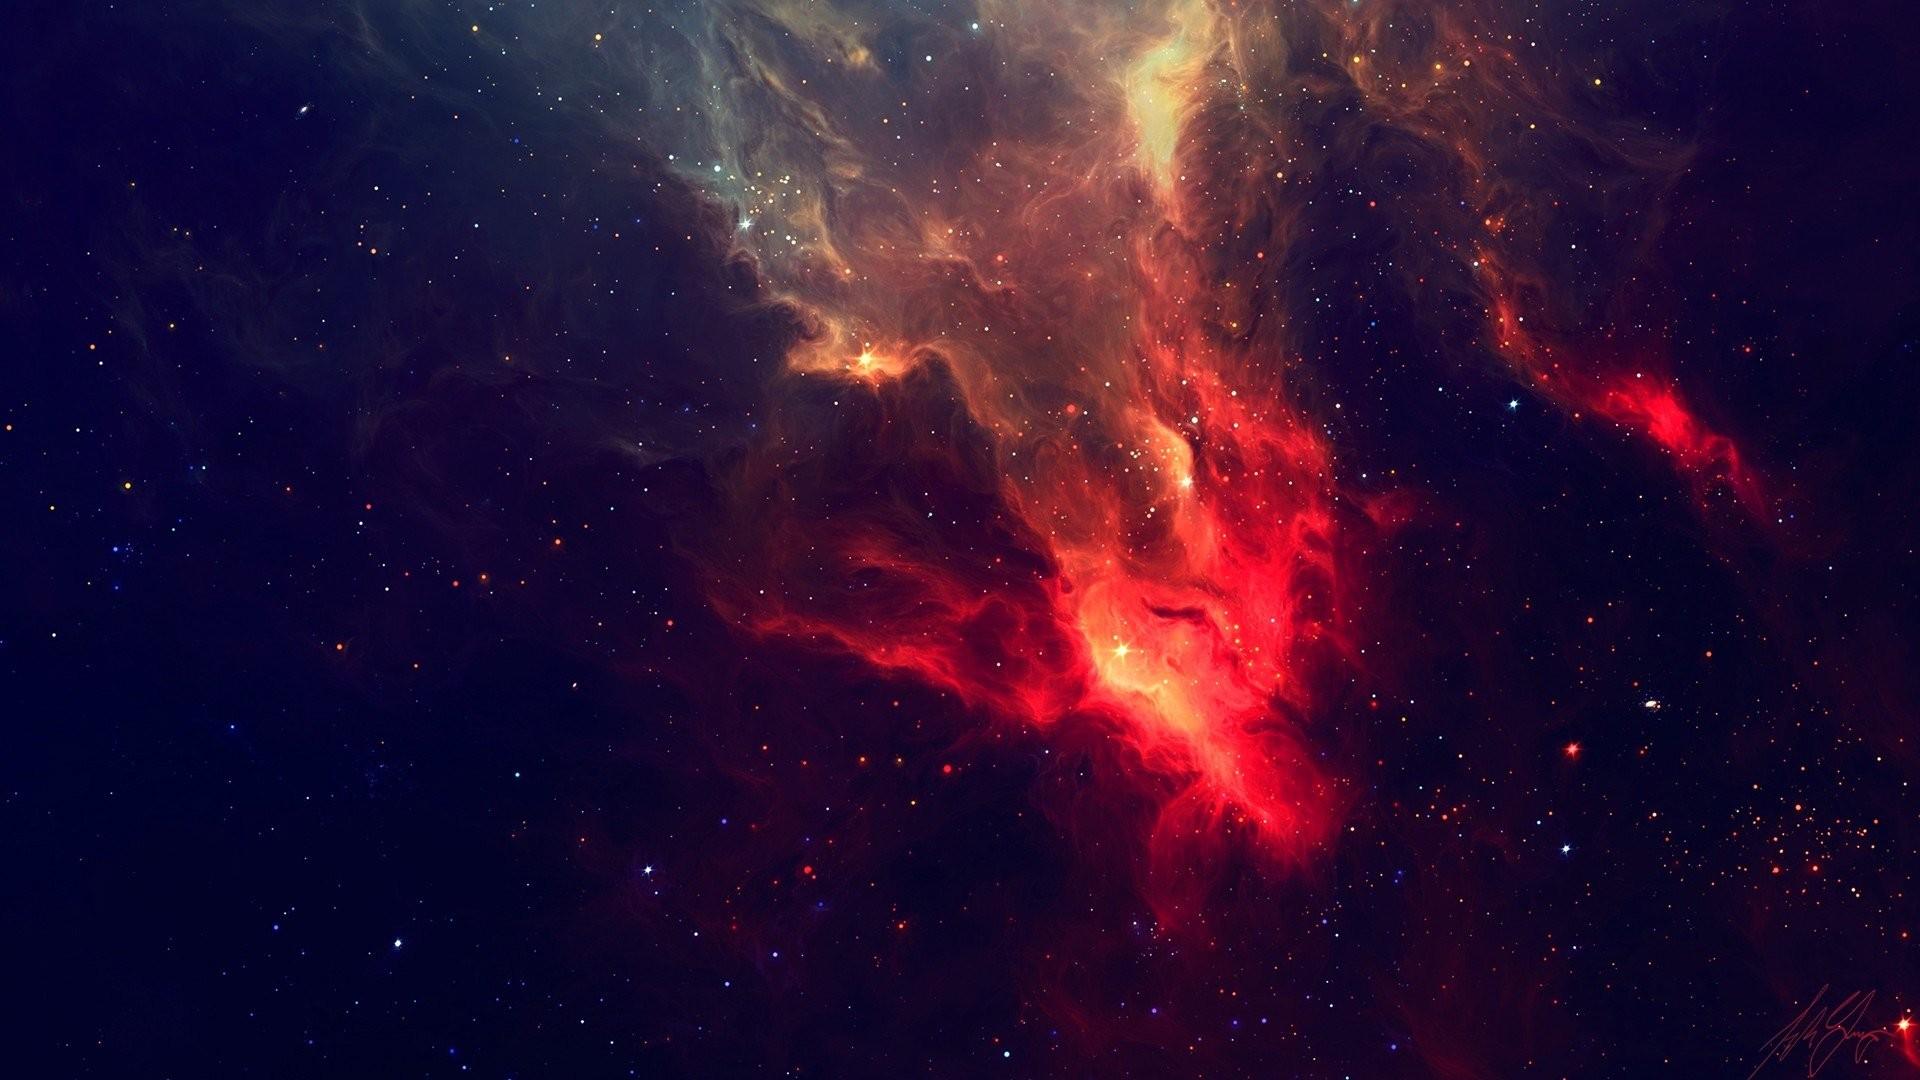 Galaxy Wallpaper Tumblr Widescreen 1